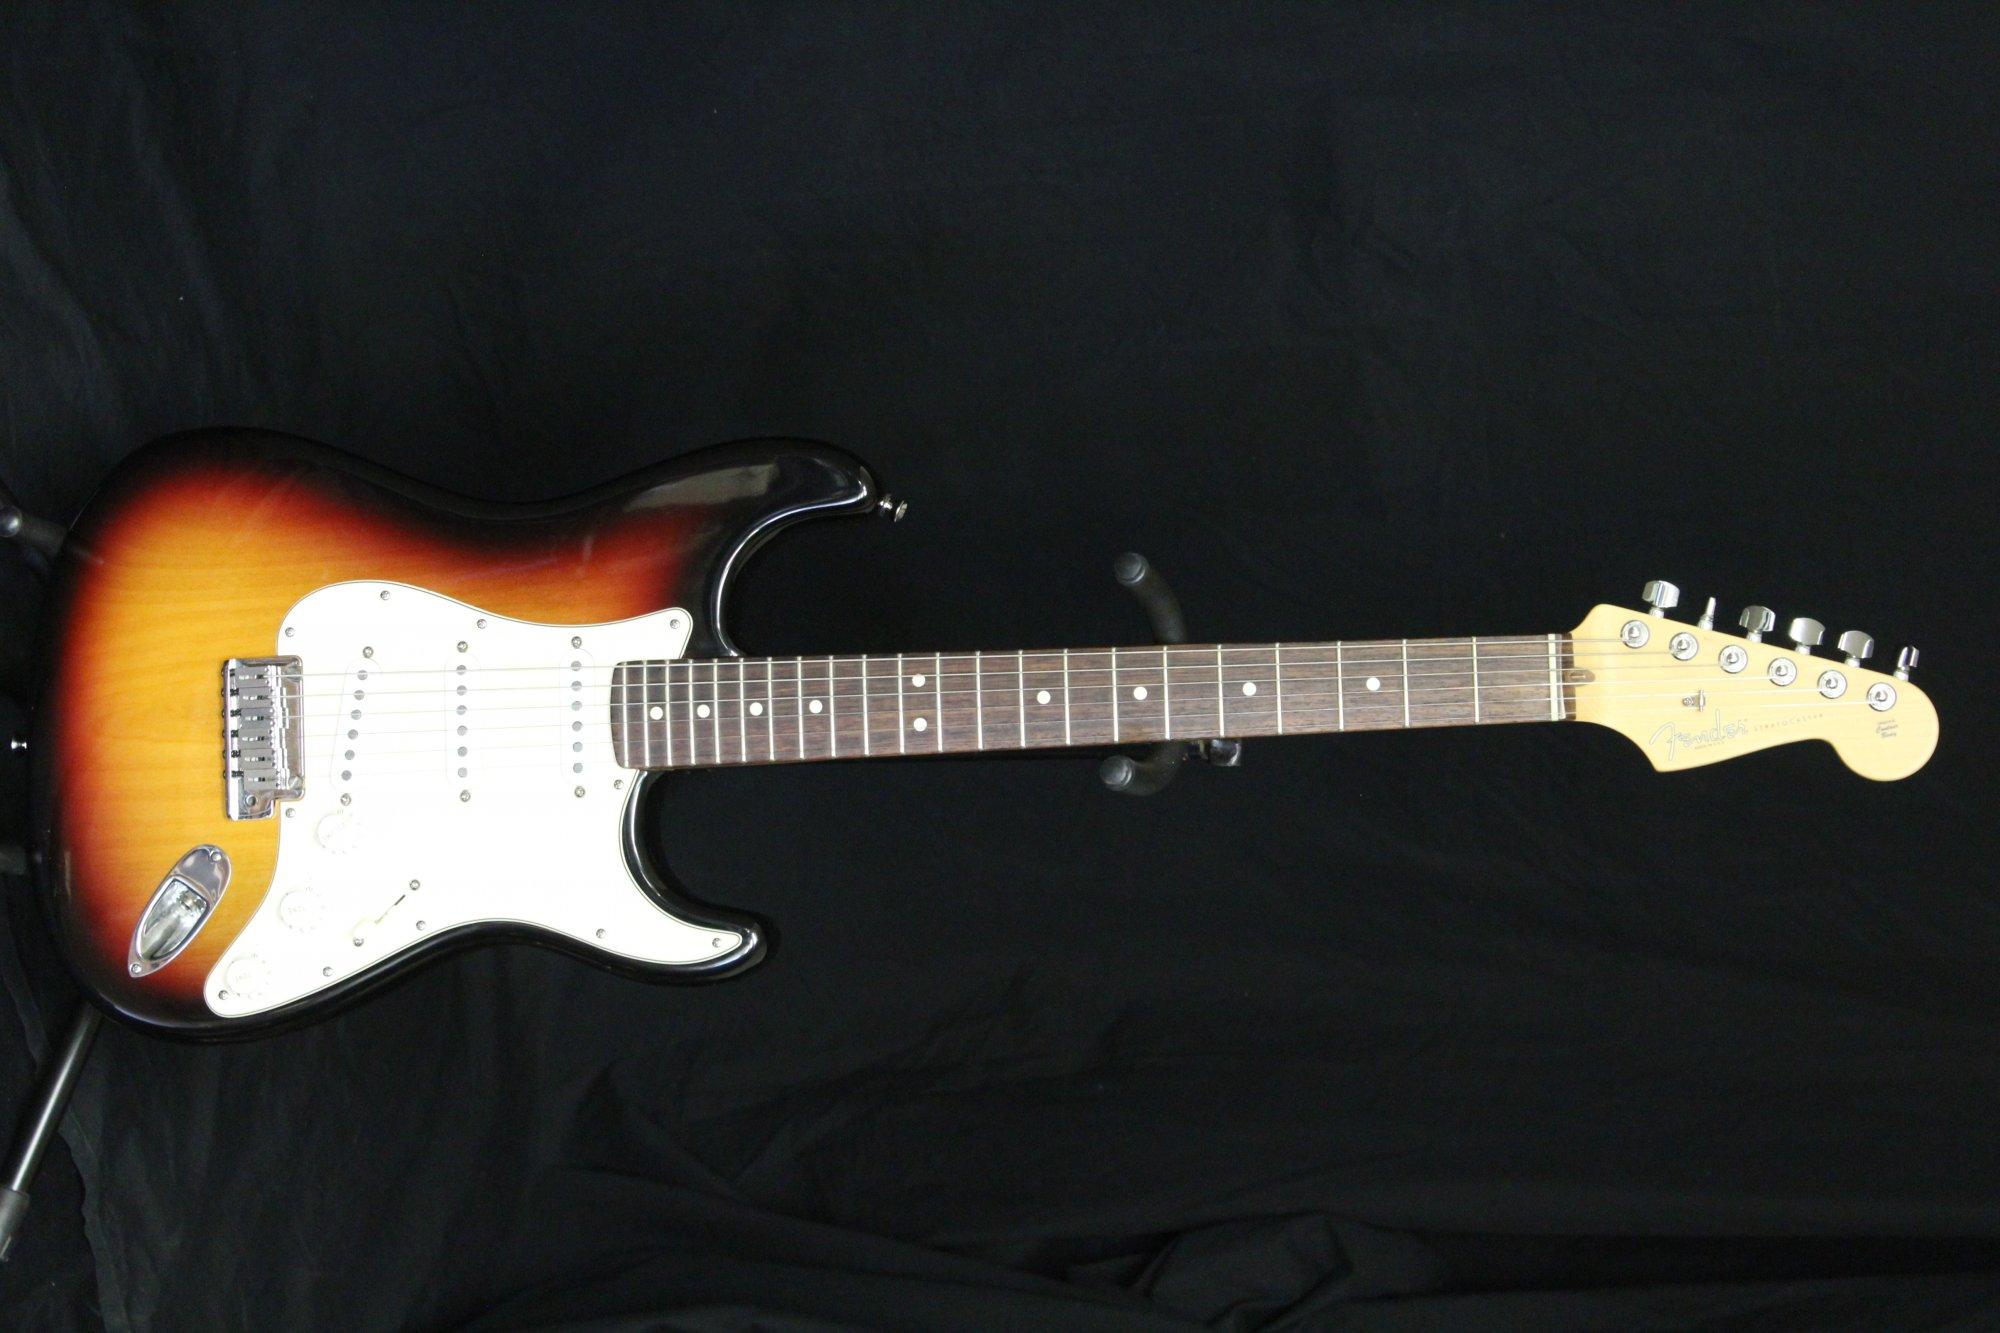 2004 Fender 50th Anniversary American Standard Stratocaster - Sunburst